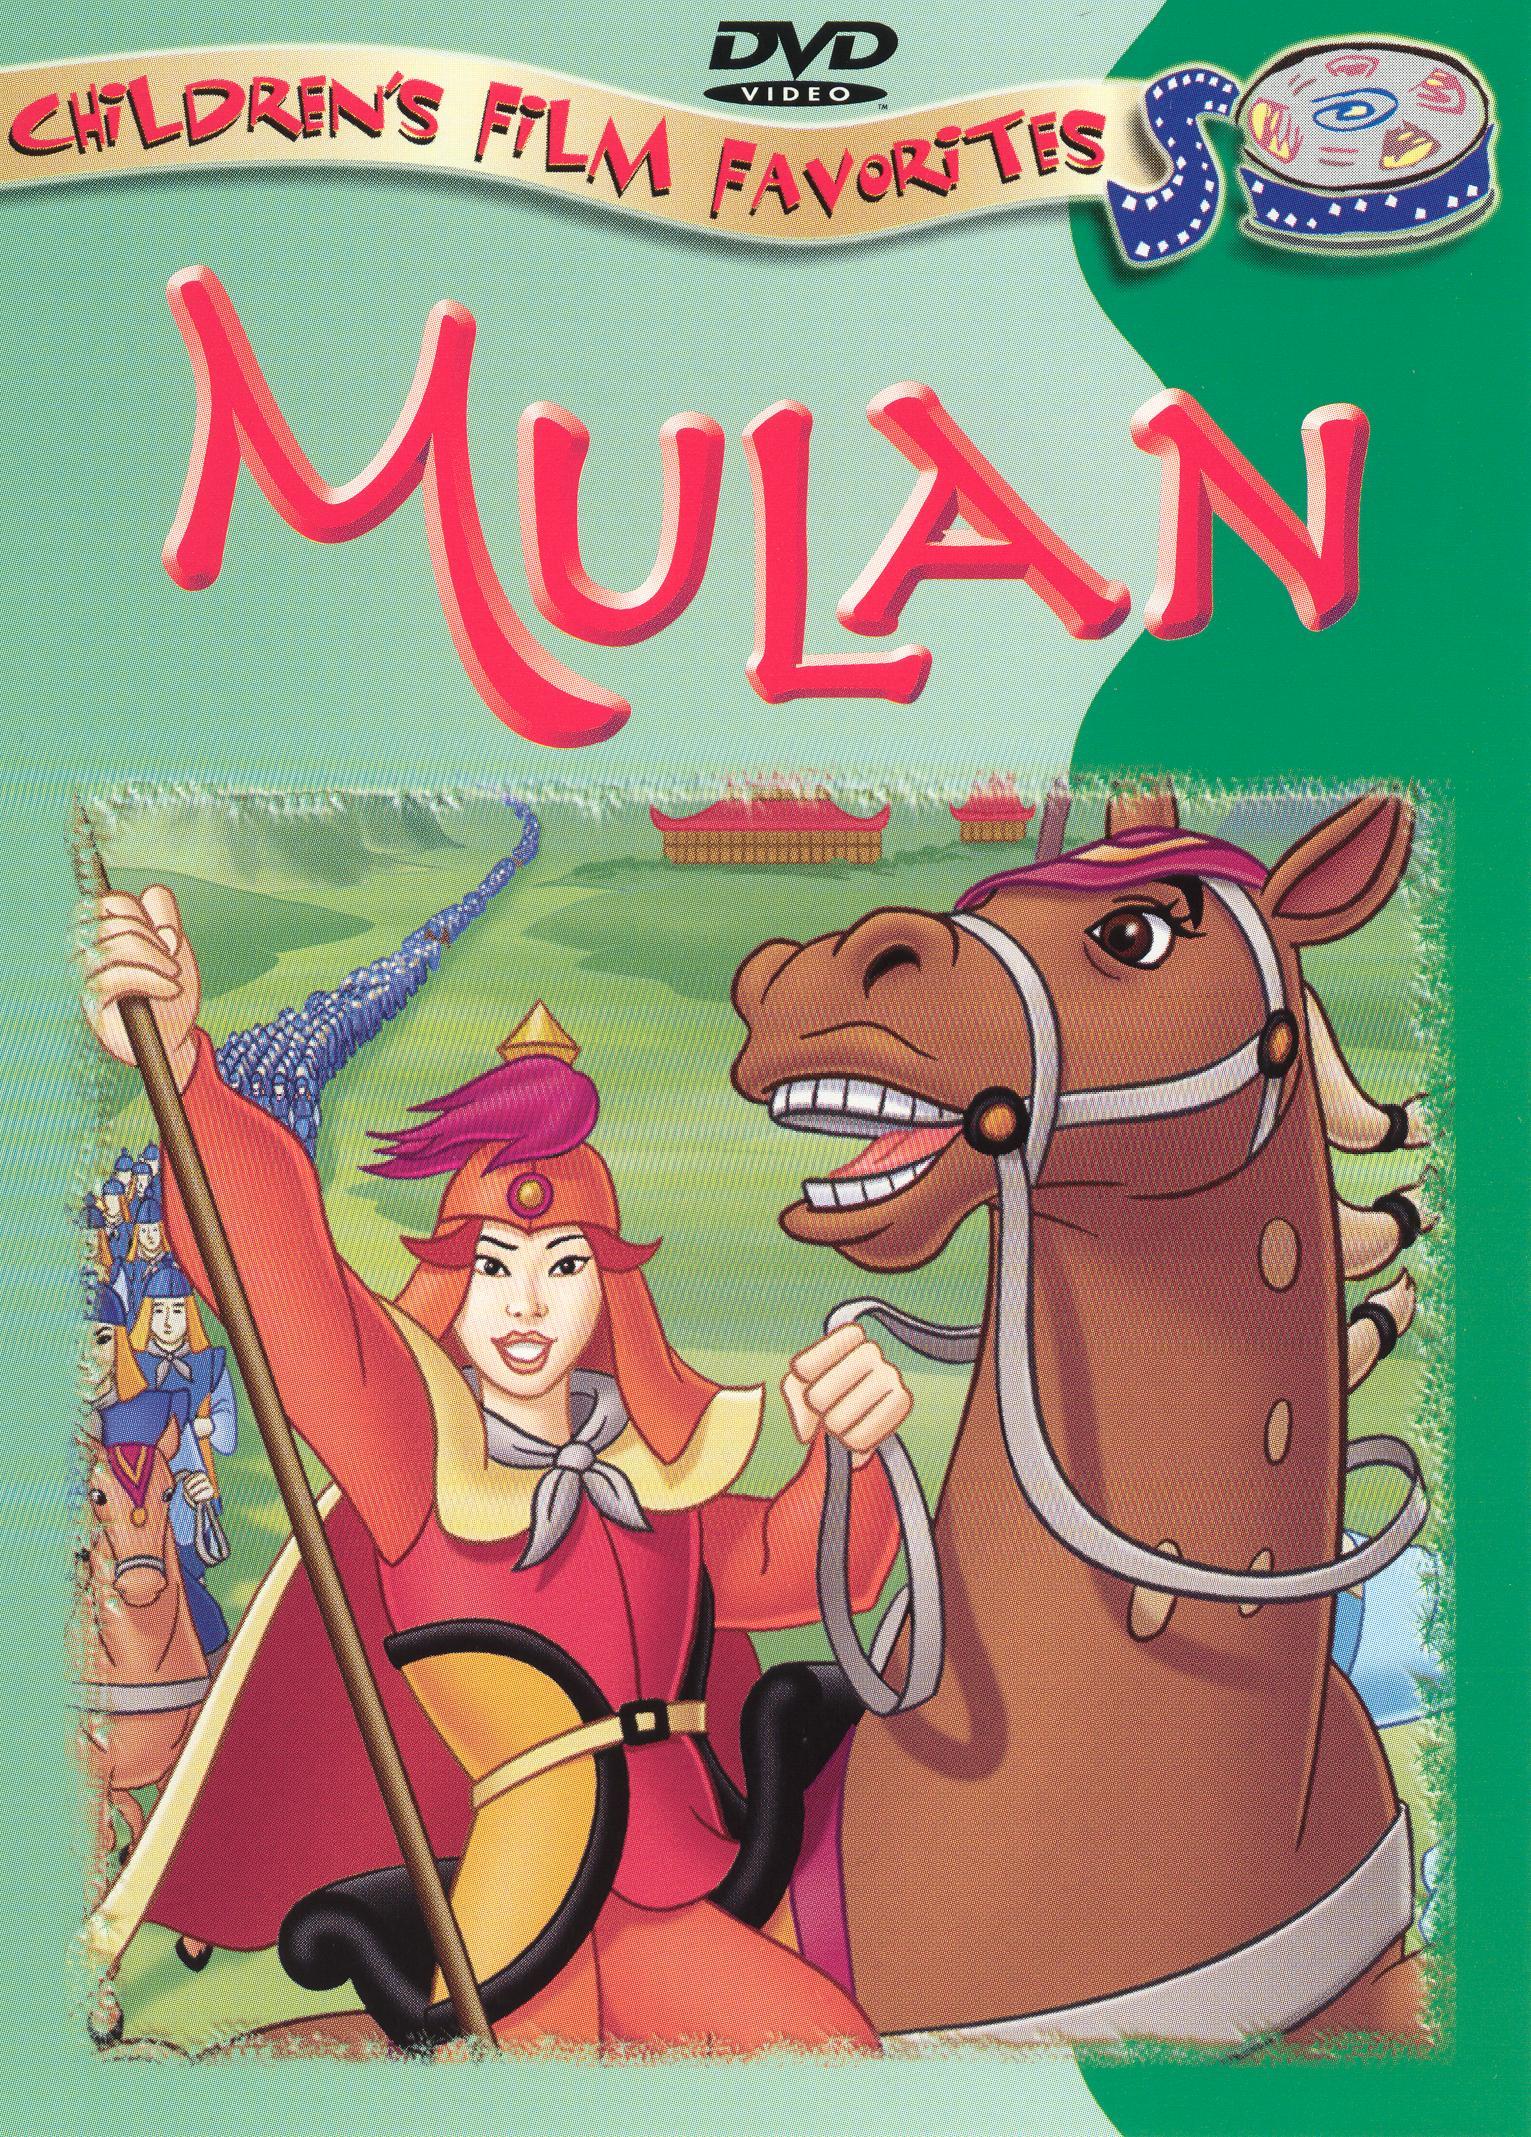 Children's Film Favorites: Mulan